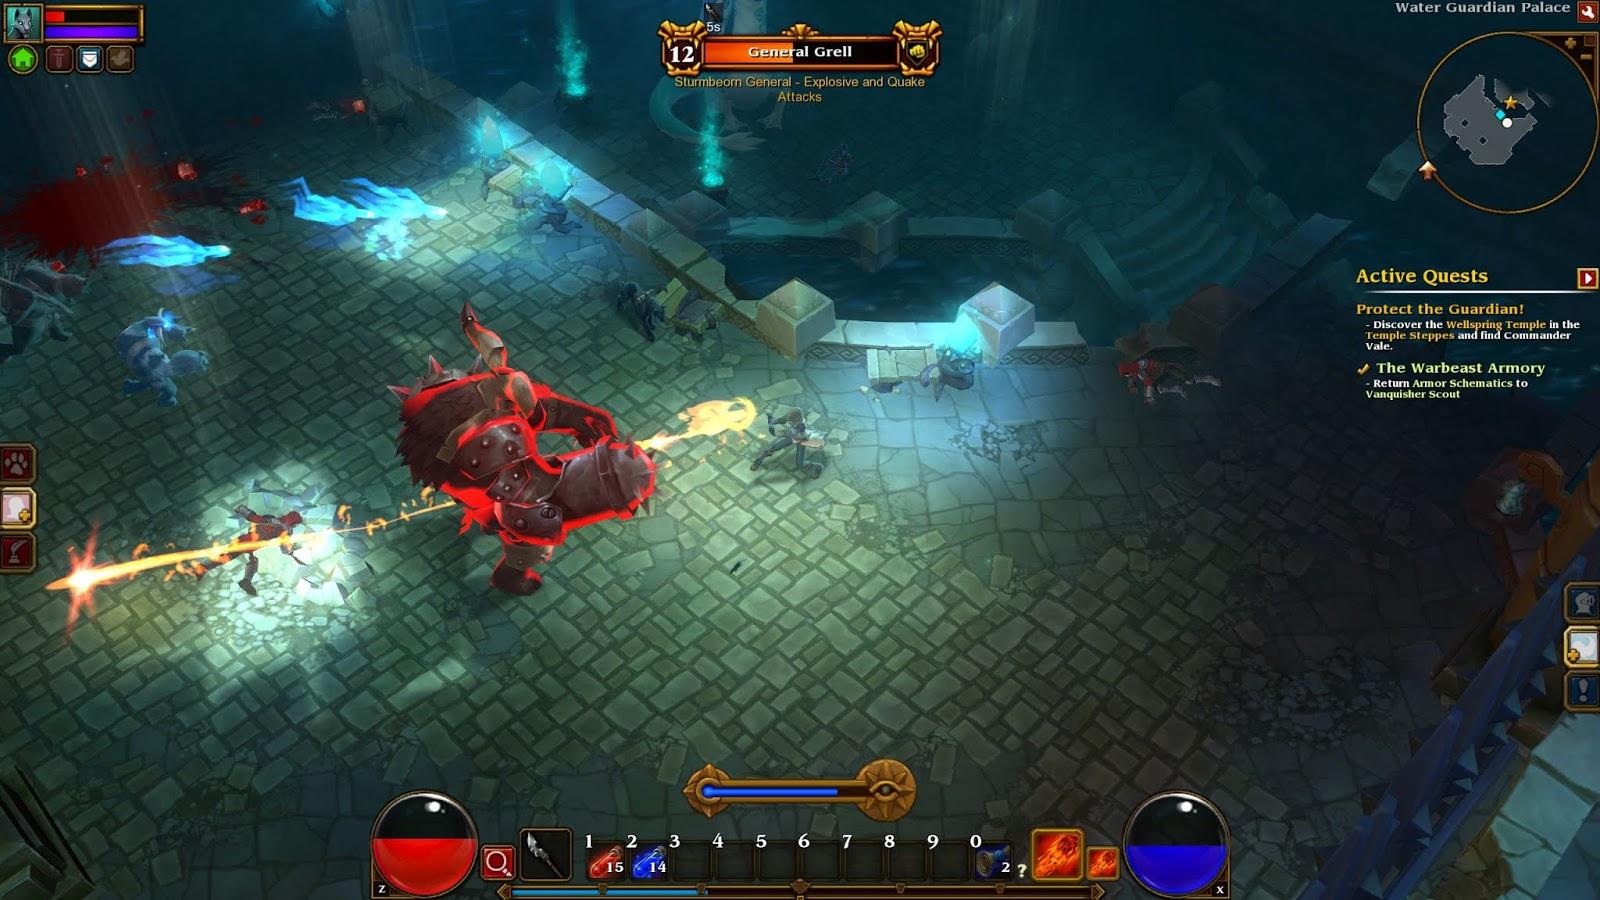 Torchlight II (PC) (2012) - AoM: Video Games